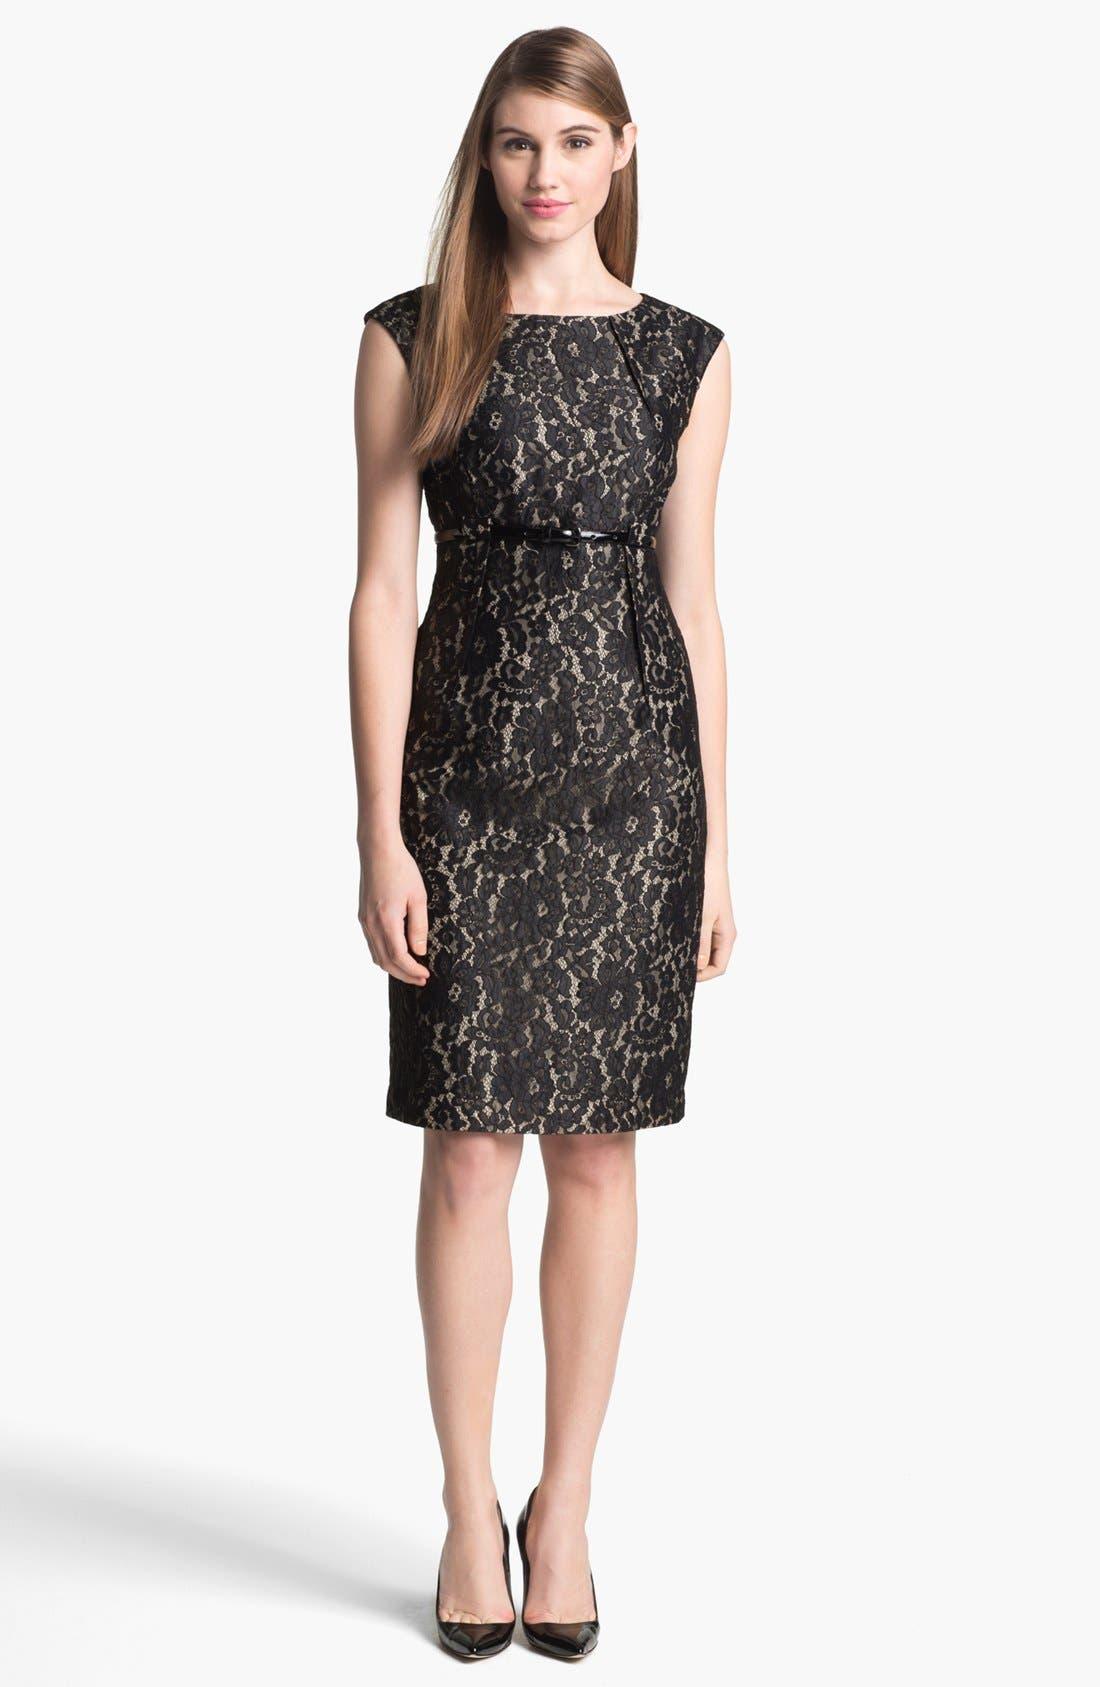 Alternate Image 1 Selected - Calvin Klein Belted Lace Sheath Dress (Regular & Petite)